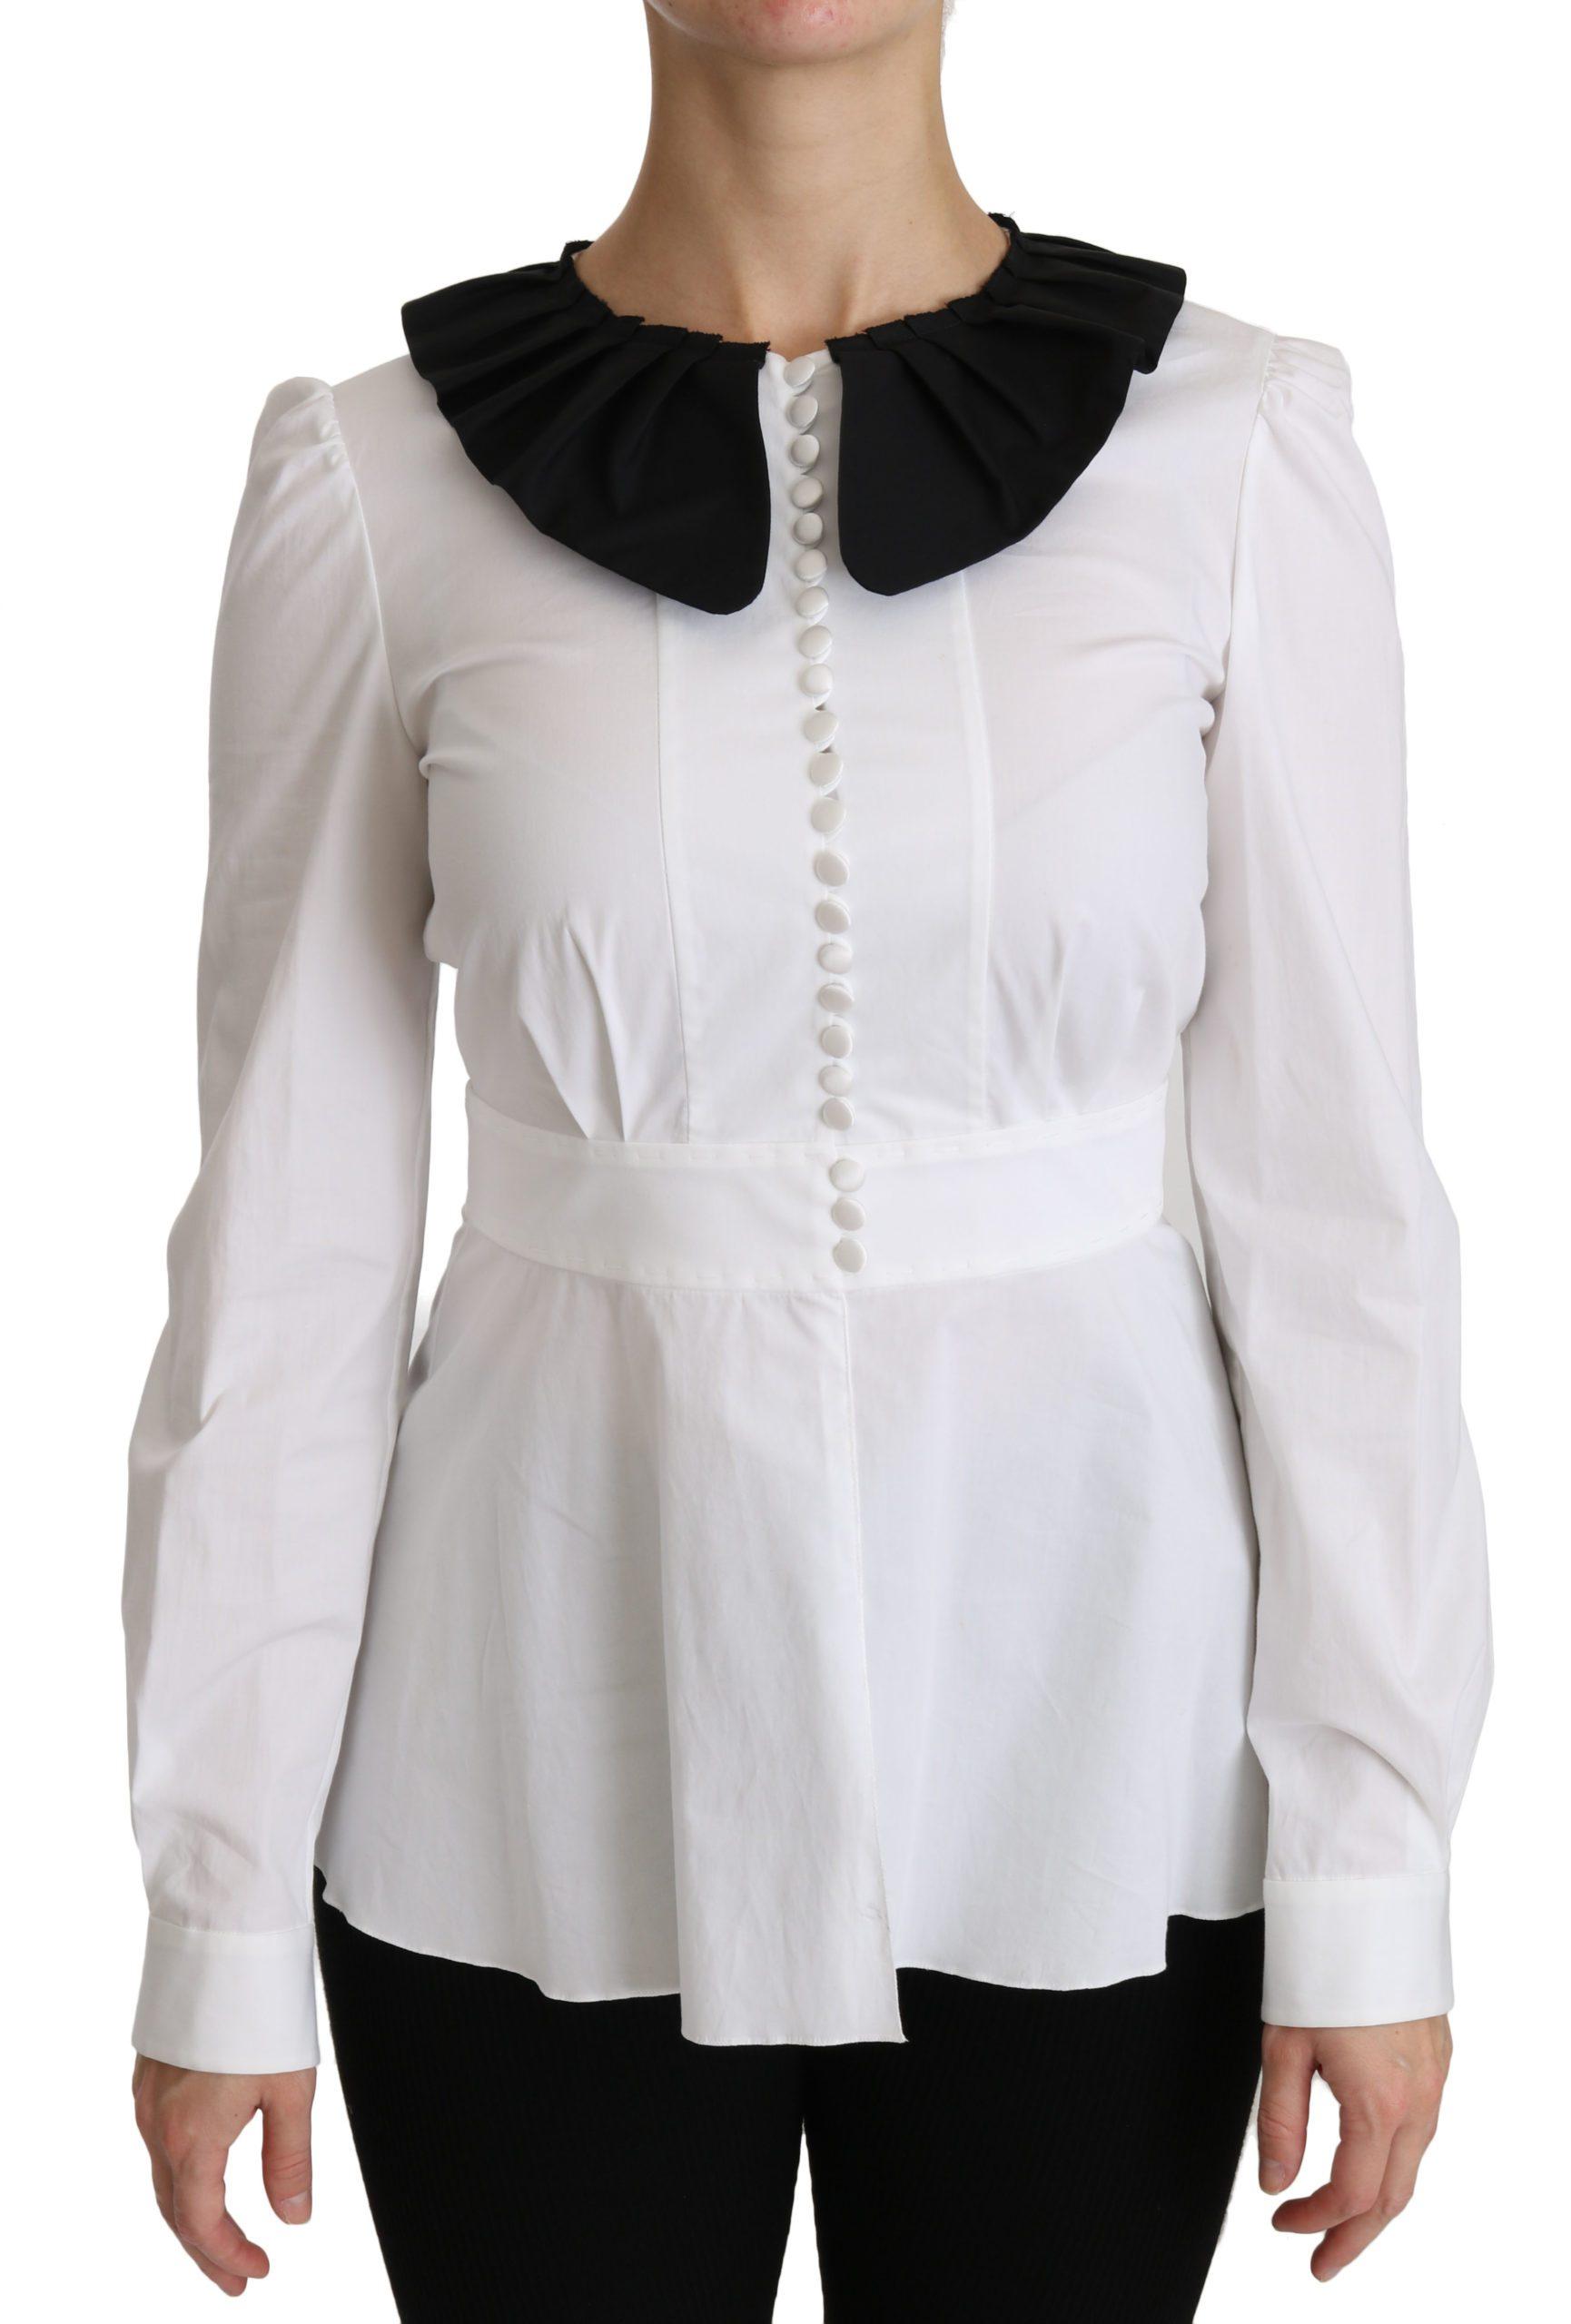 Dolce & Gabbana Women's Collared LS Top White TSH4315 - IT40|S